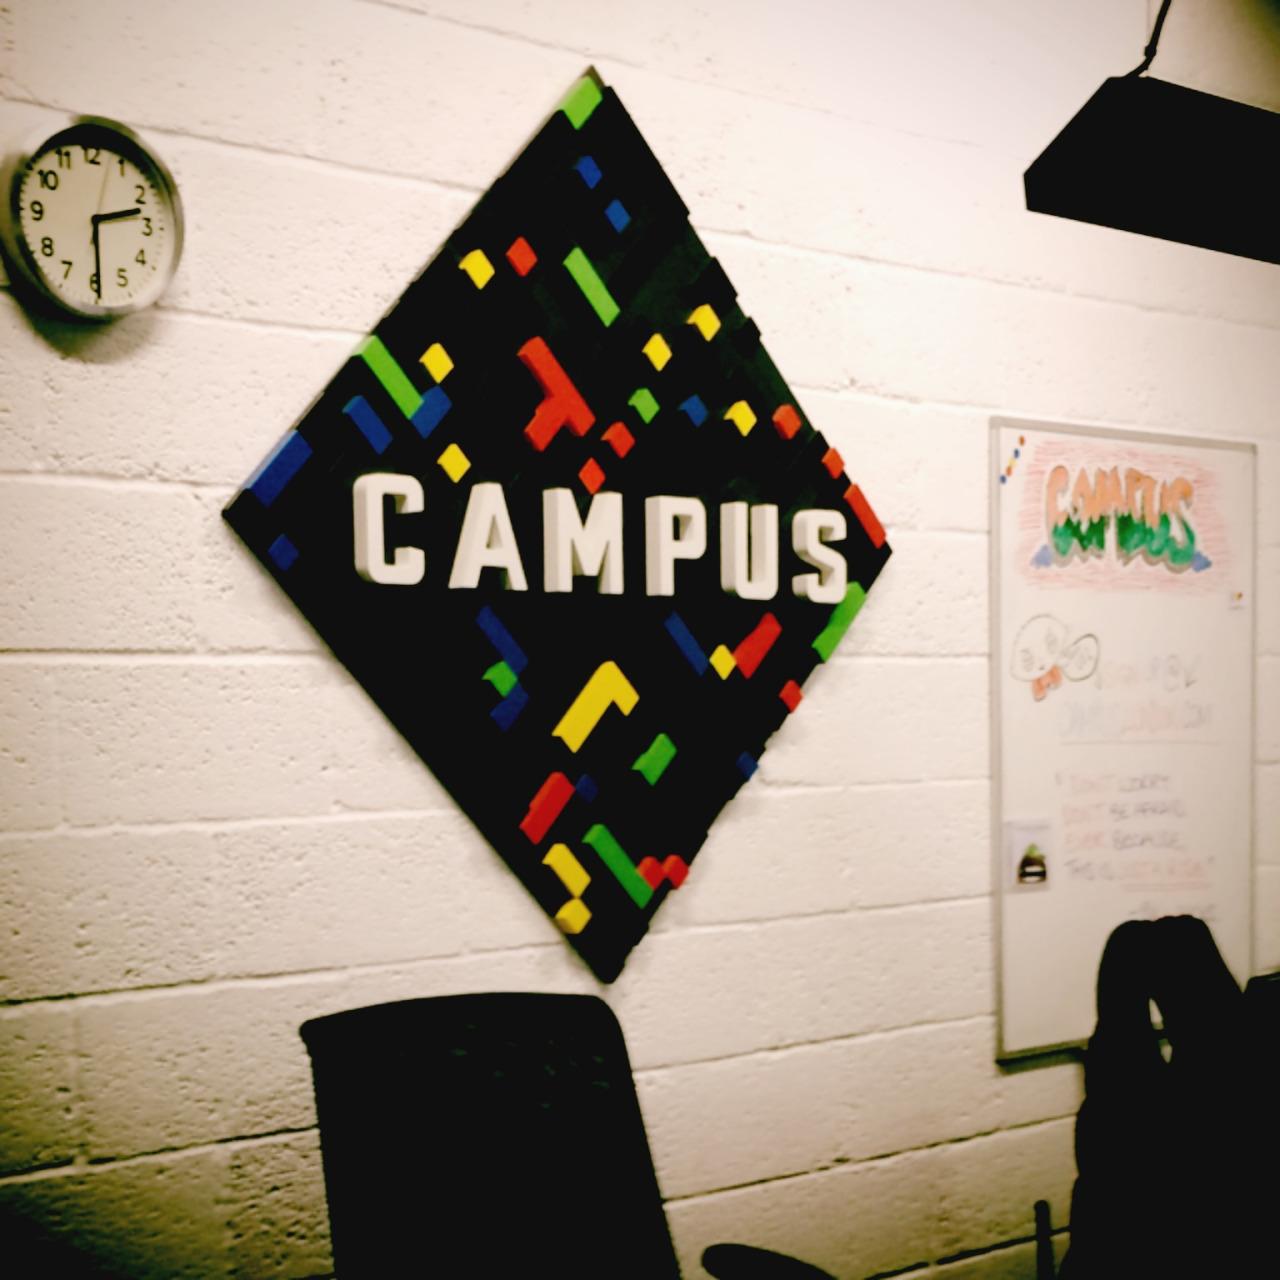 visiting Campus London